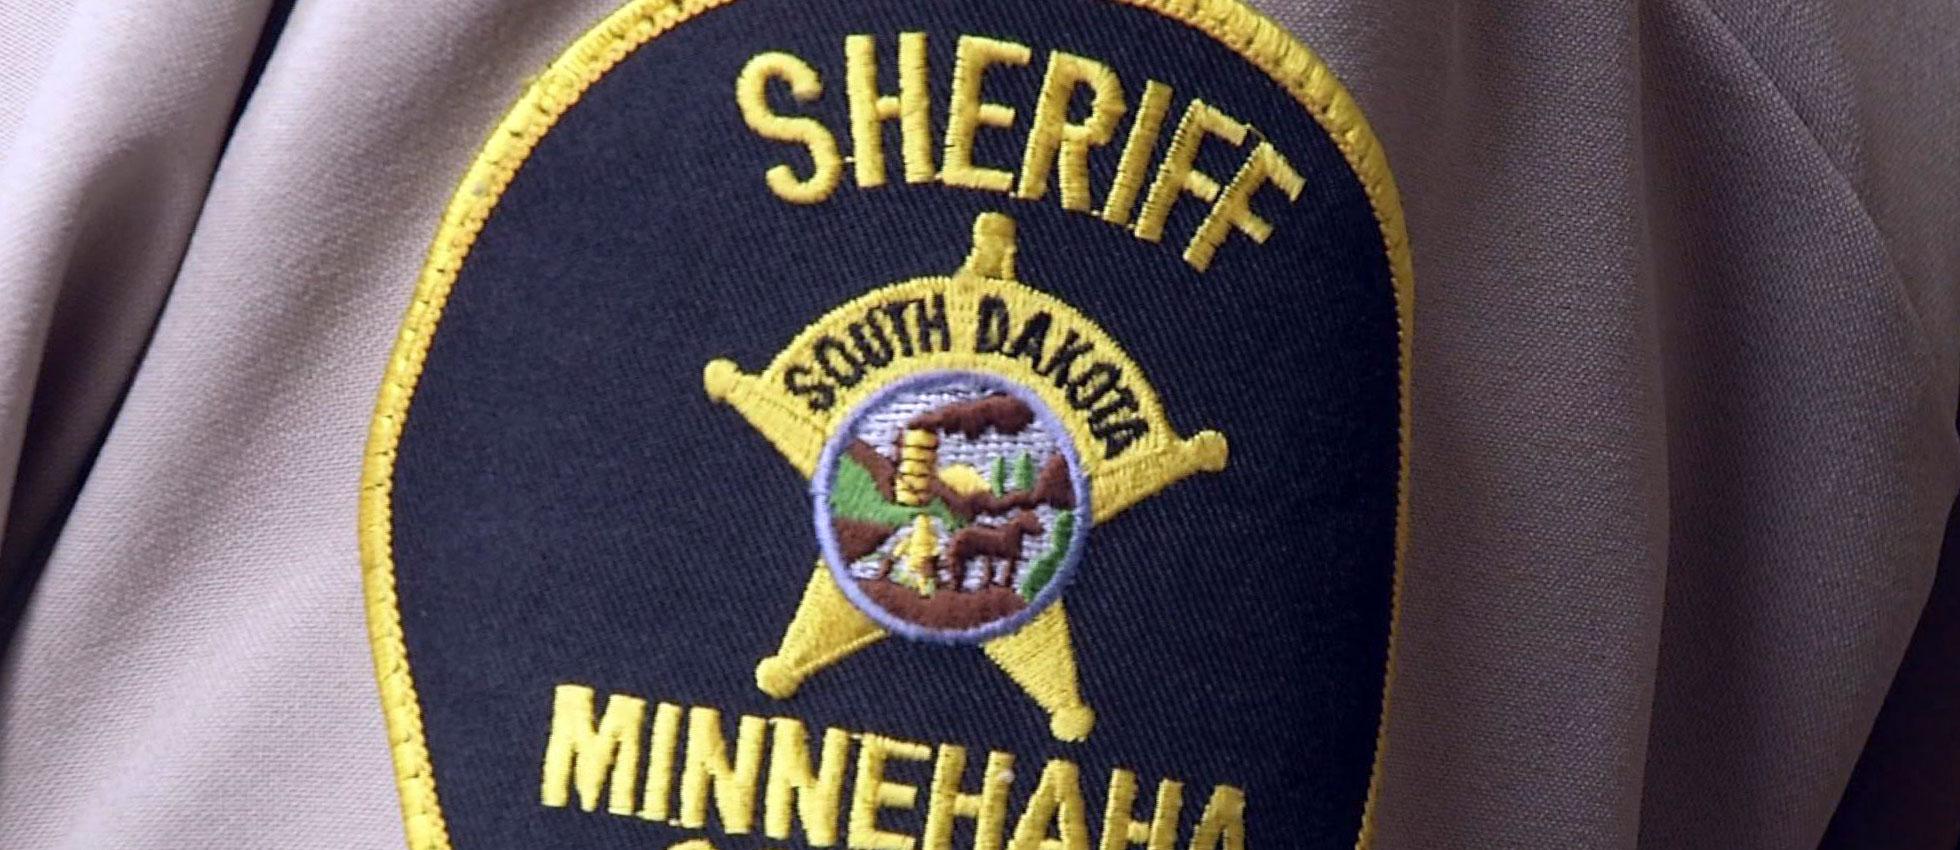 Minnehaha County Sheriff